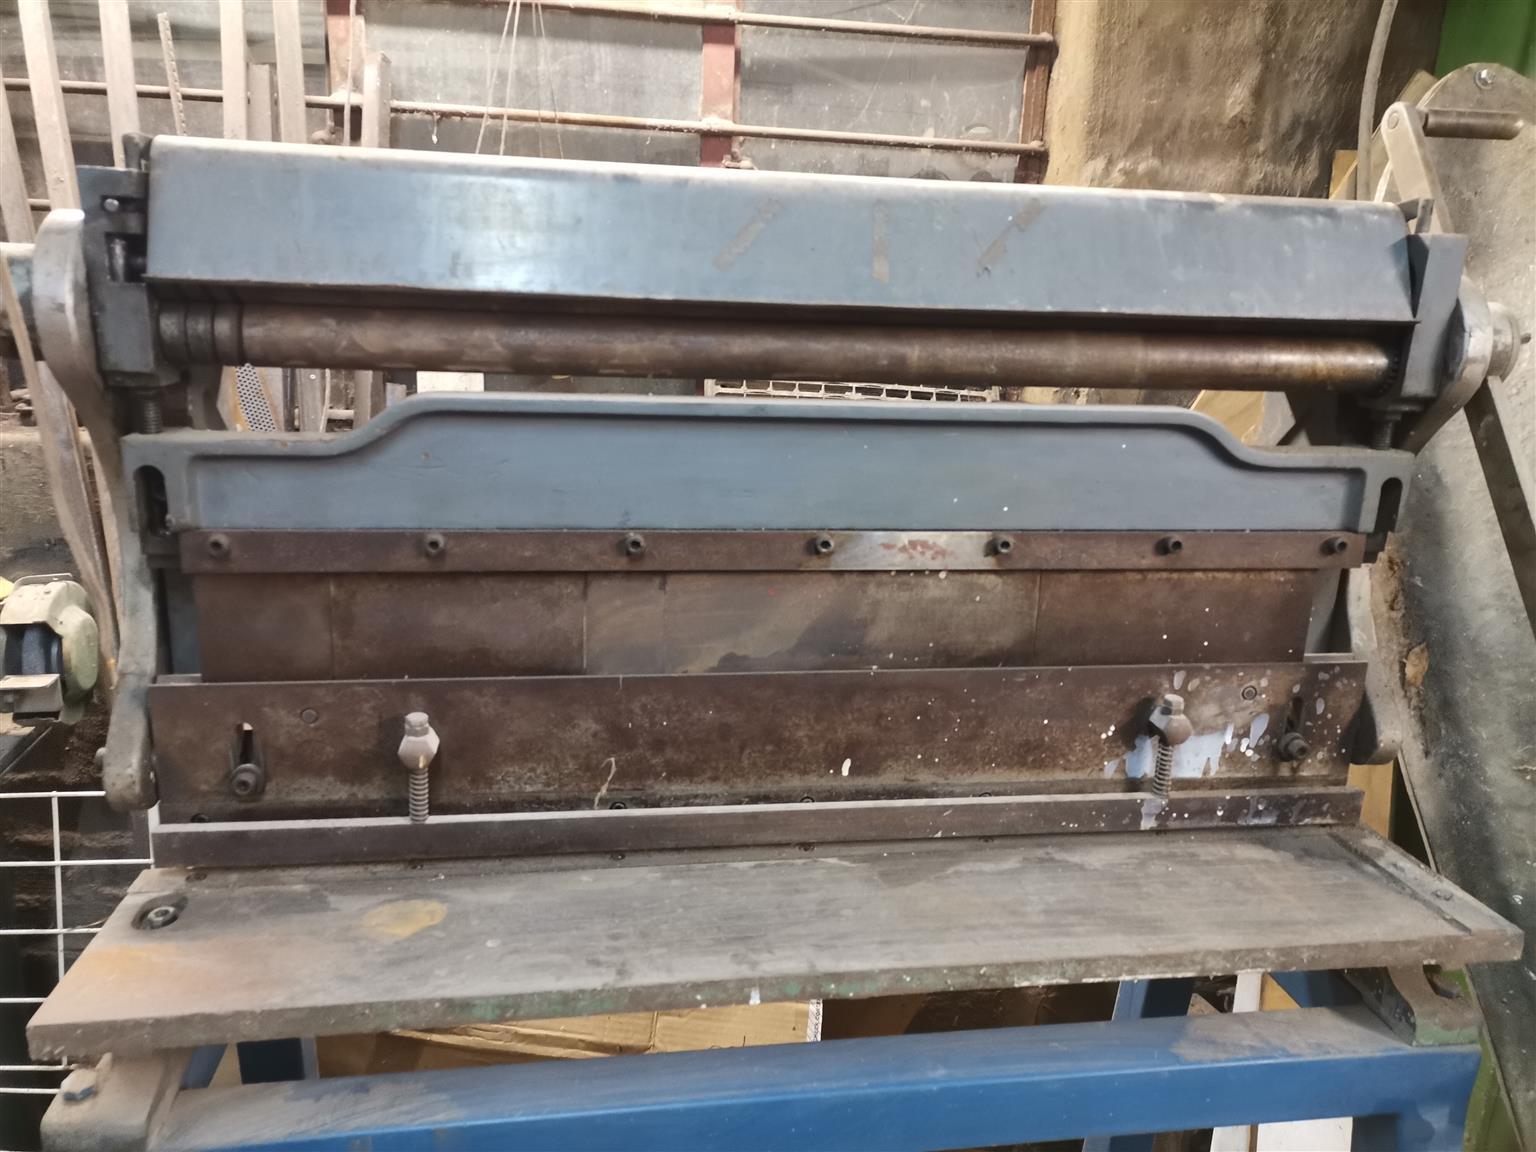 Bending gelatin and rolling machine